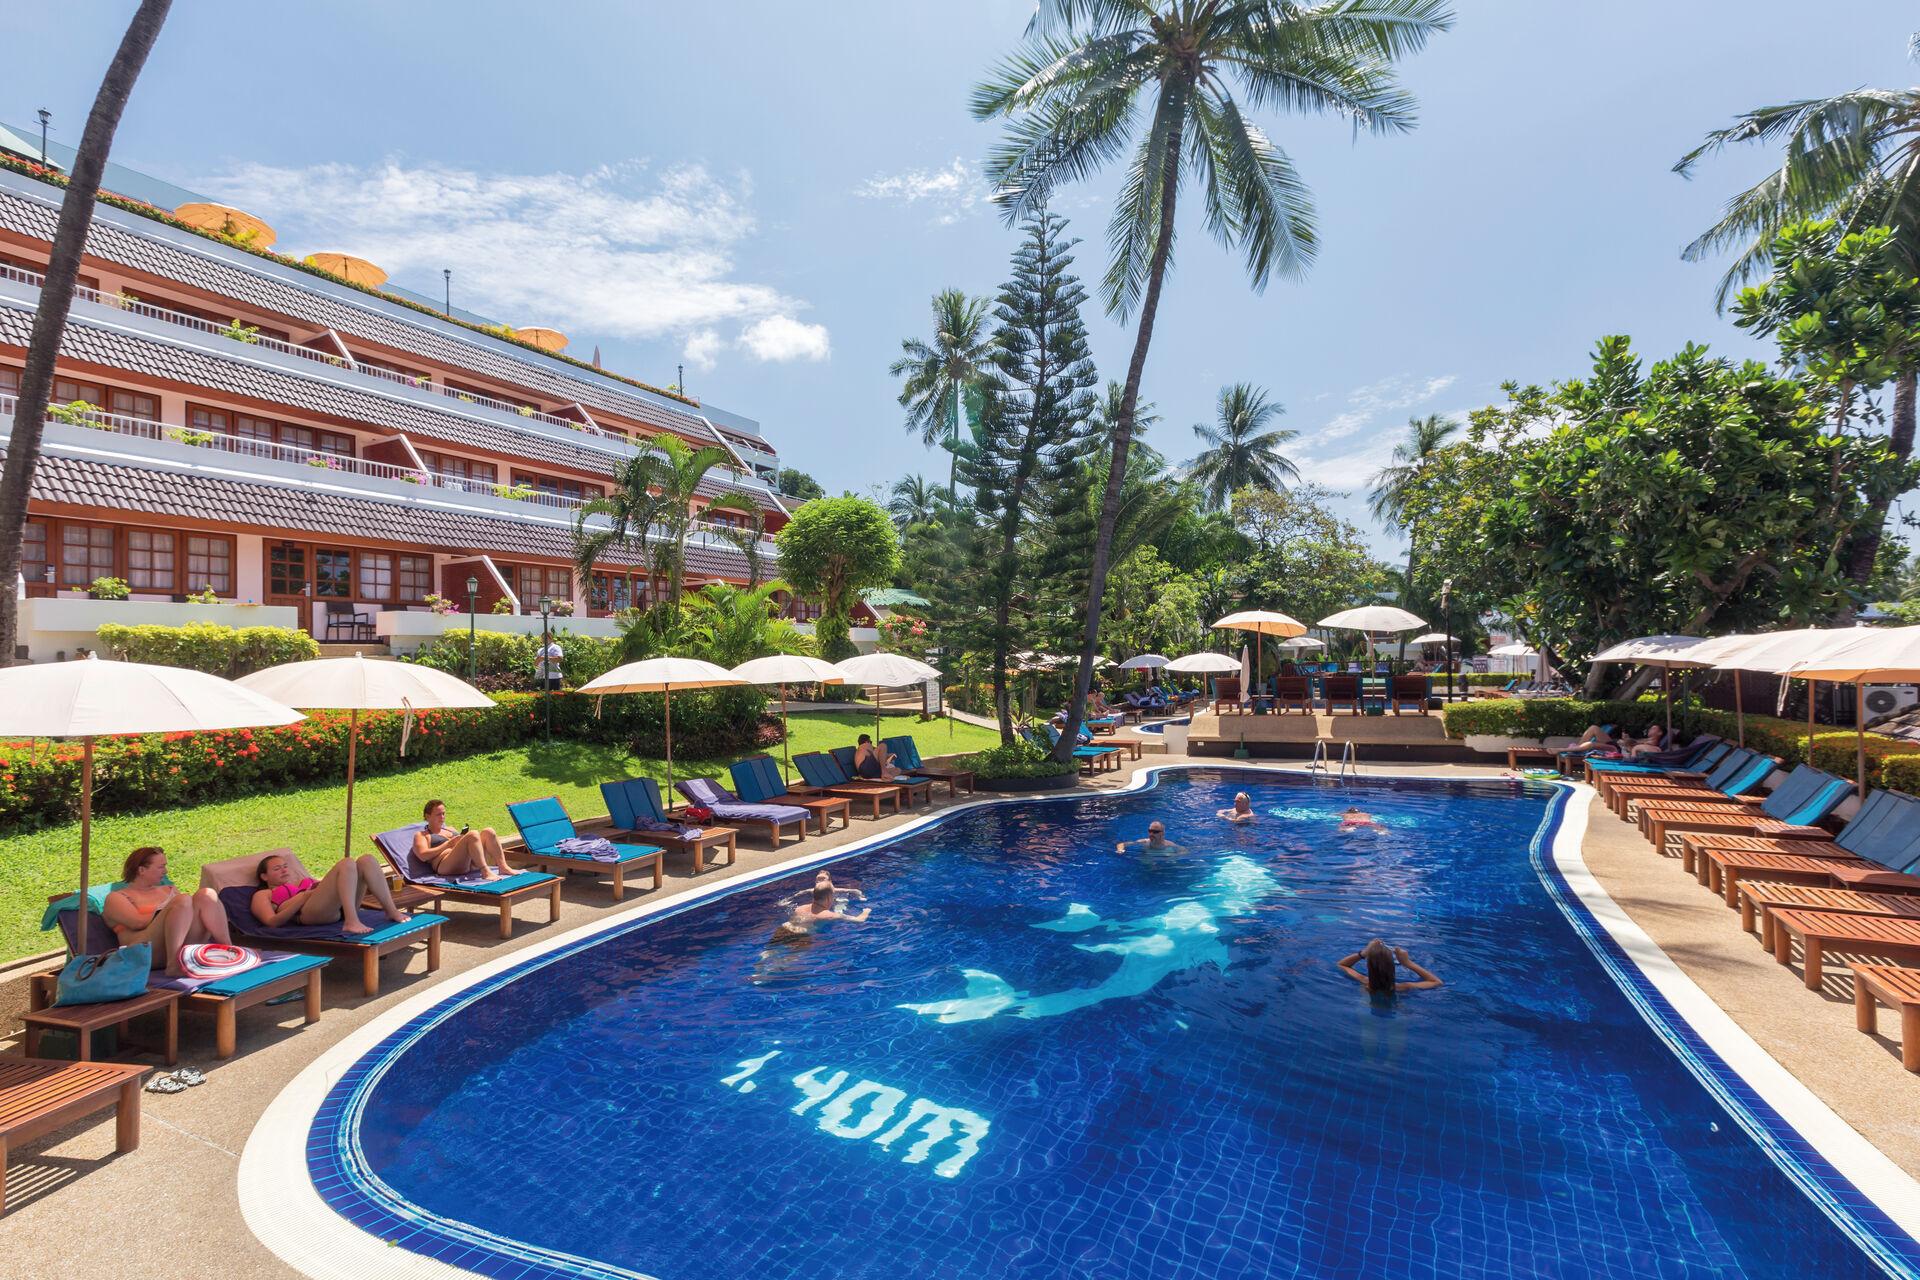 Thaïlande - Phuket - Karon - Hôtel Best Western Phuket Ocean Resort 3*